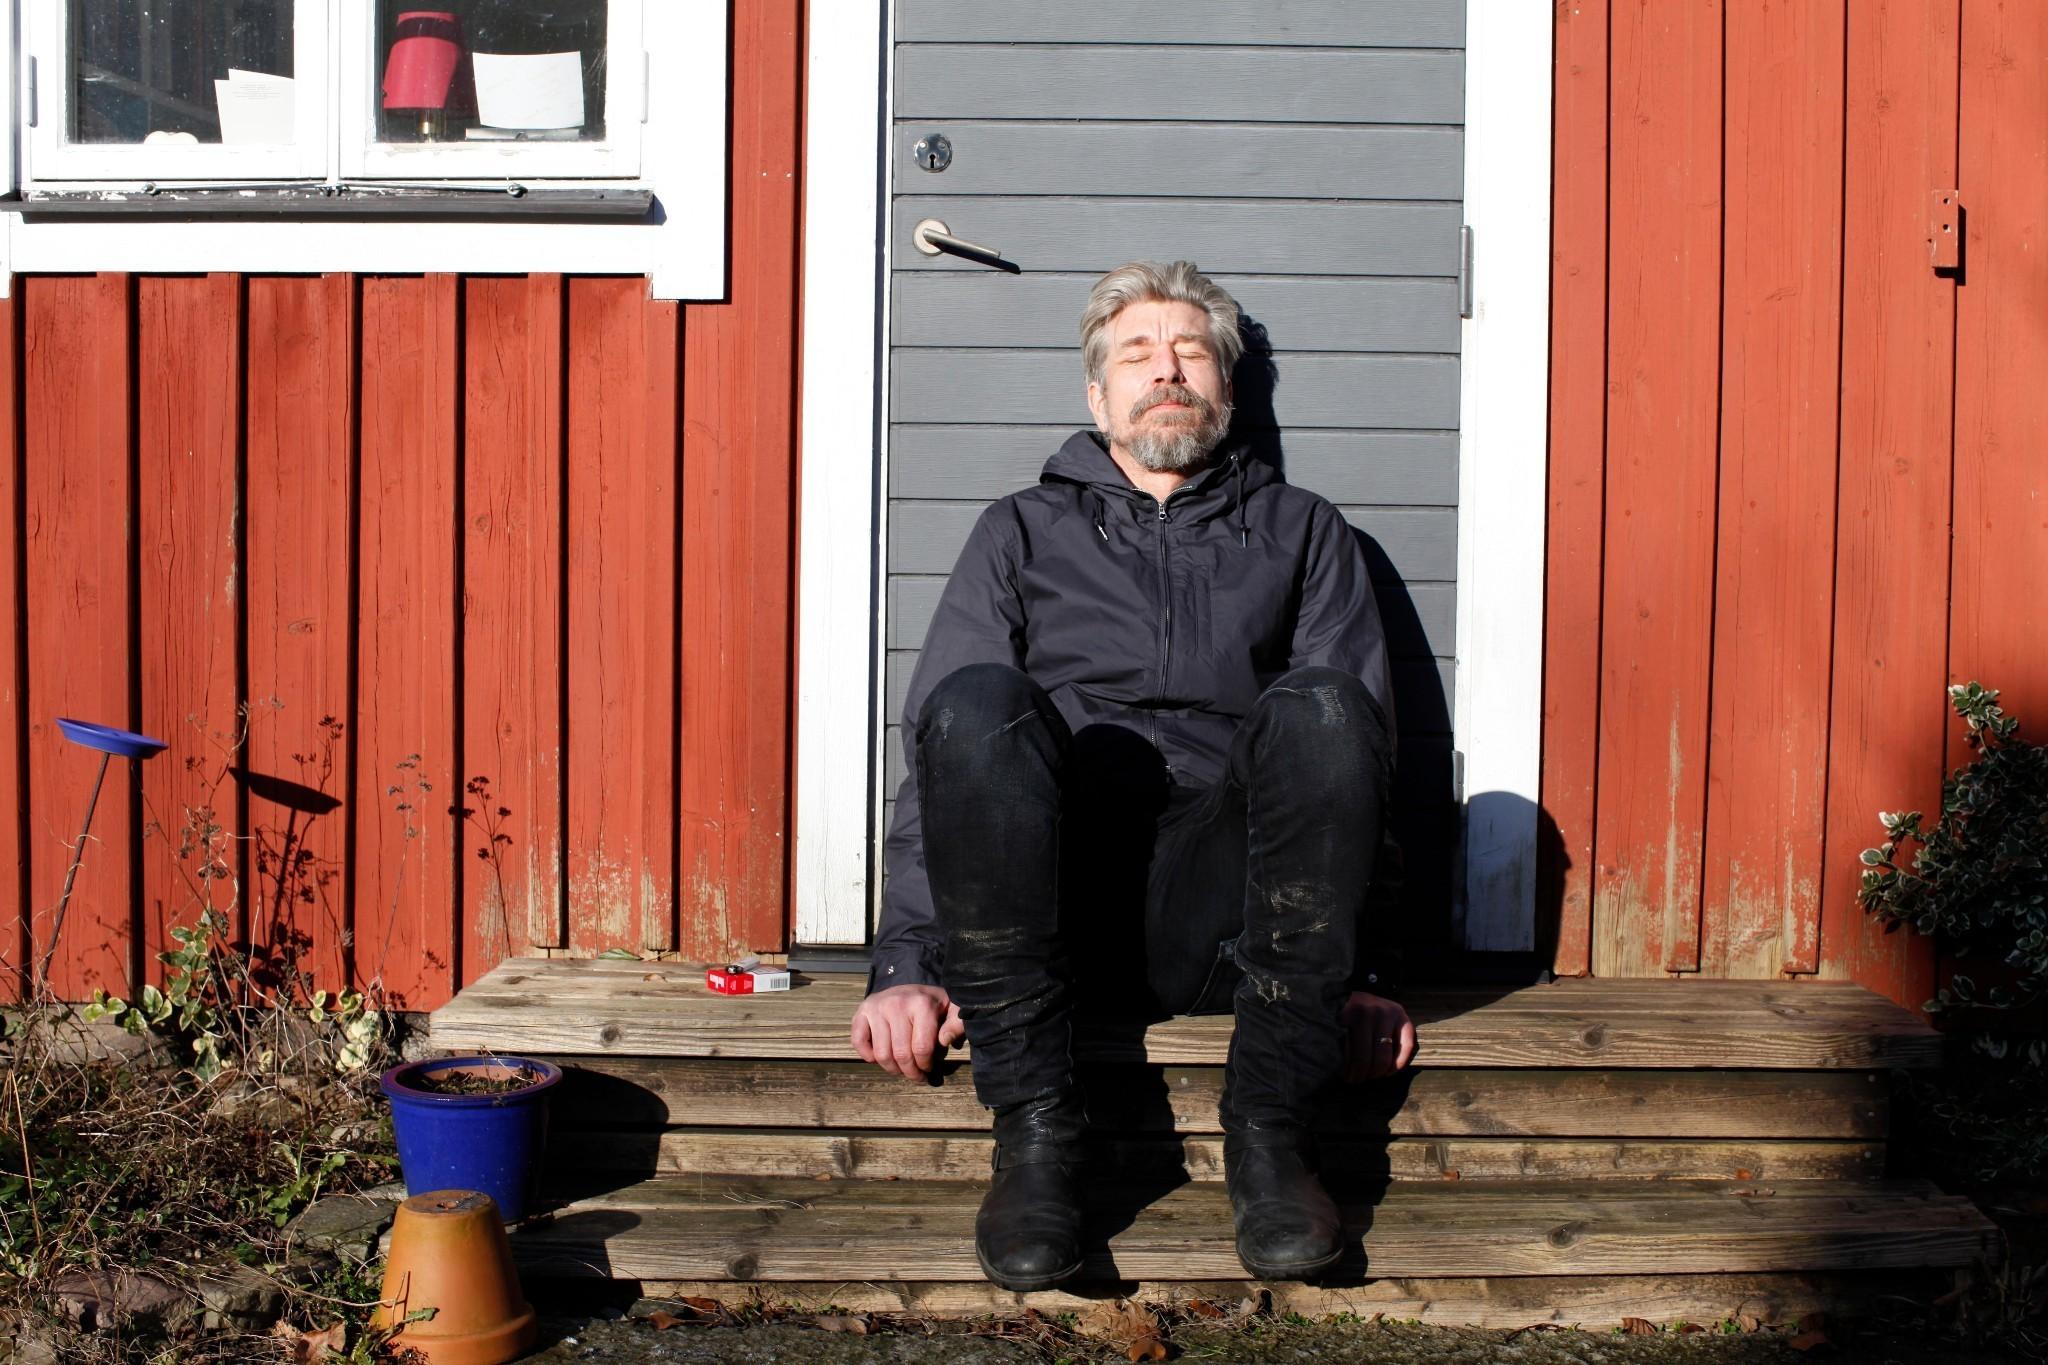 Karl Ove Knausgaard: what makes life worth living?